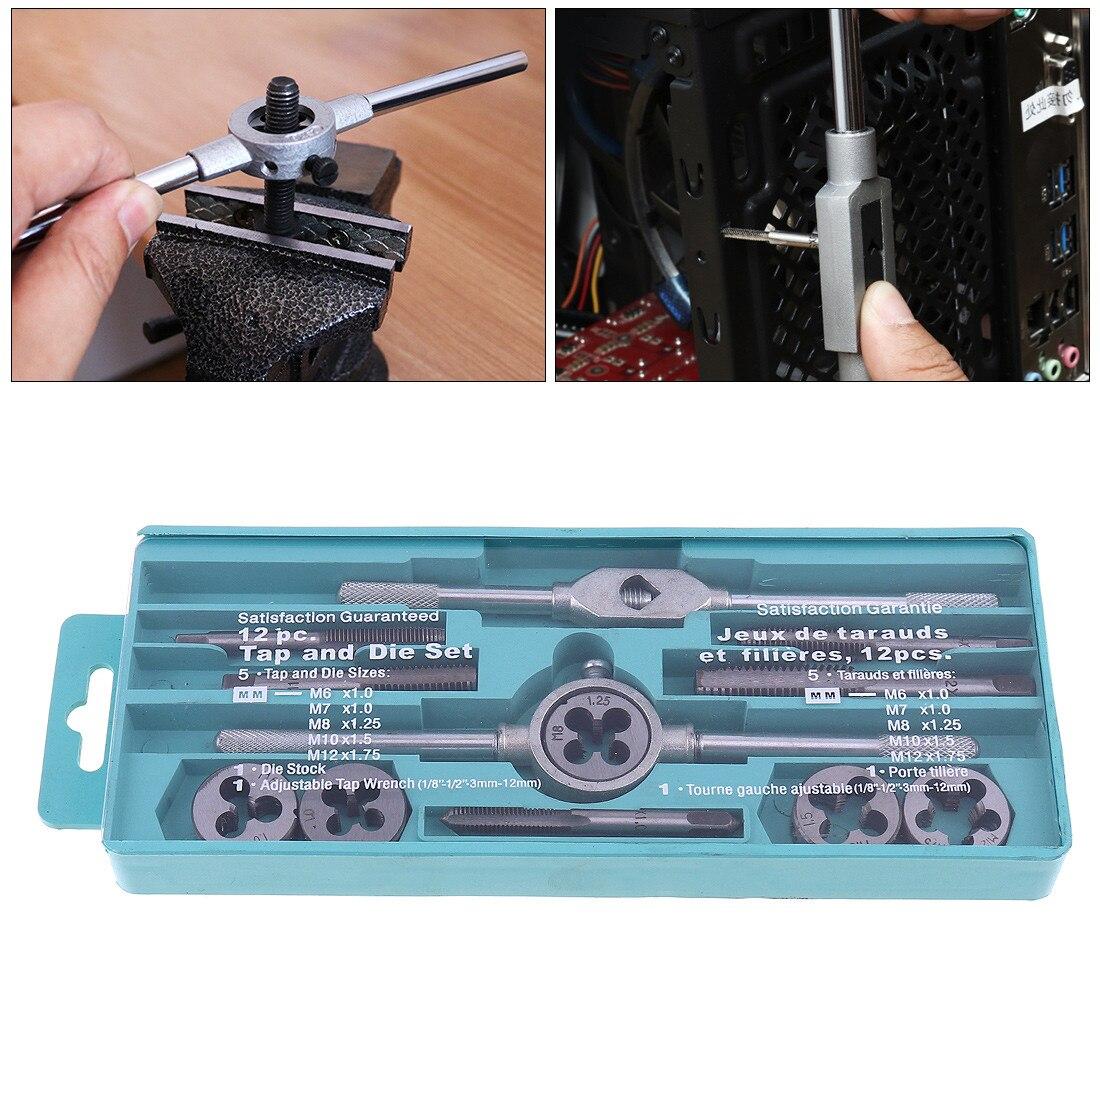 12 pz/set Multifunzione NC Screw Tap & Die Set Filettatura Esterna toccando Mano Tool Kit con M6 M7 M8 M10 M12 Rubinetti